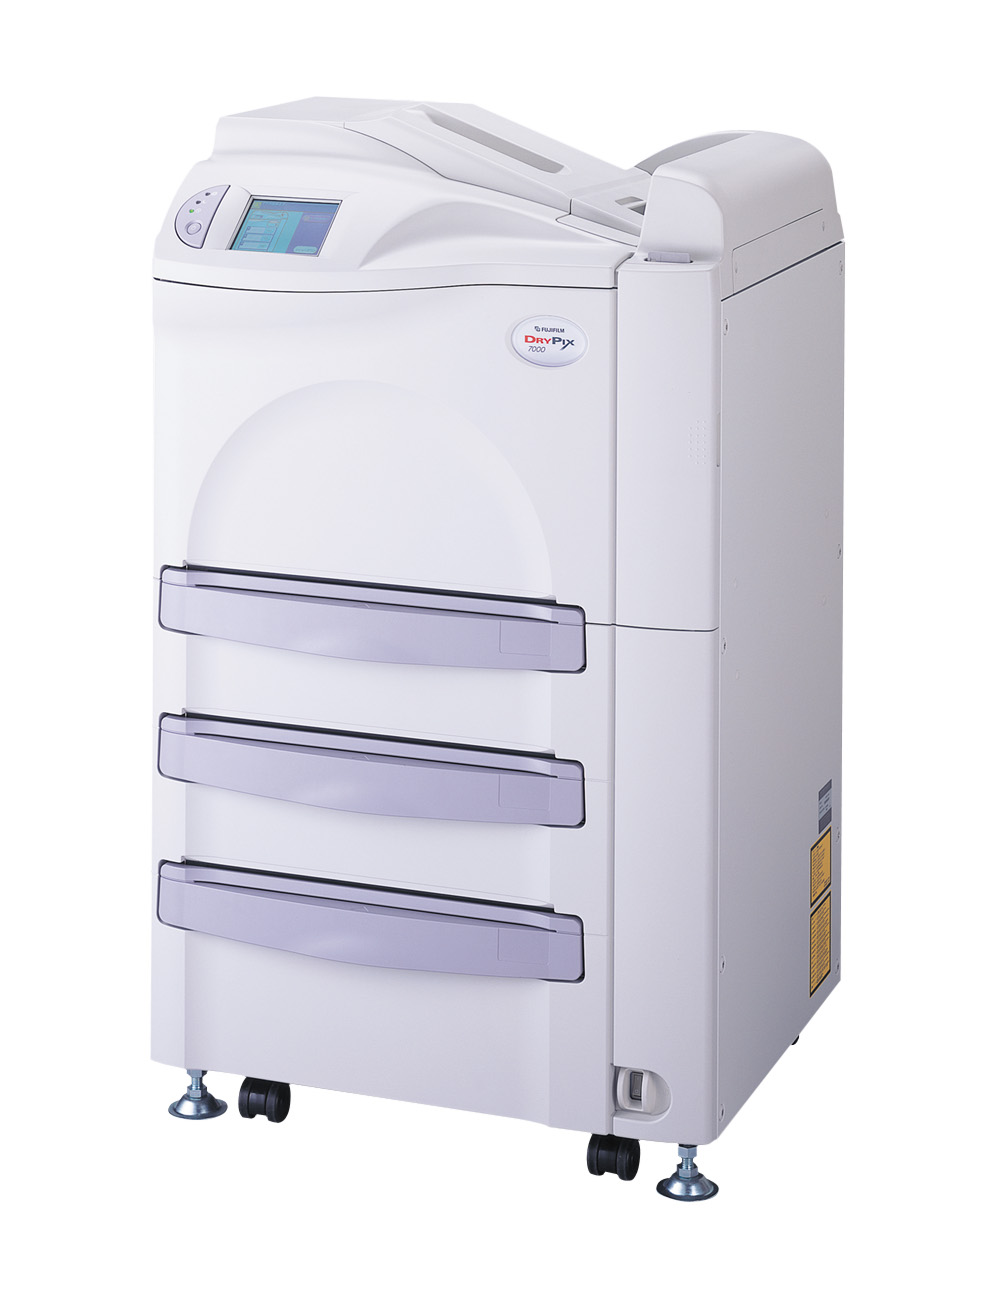 Fuji Drypix 5000